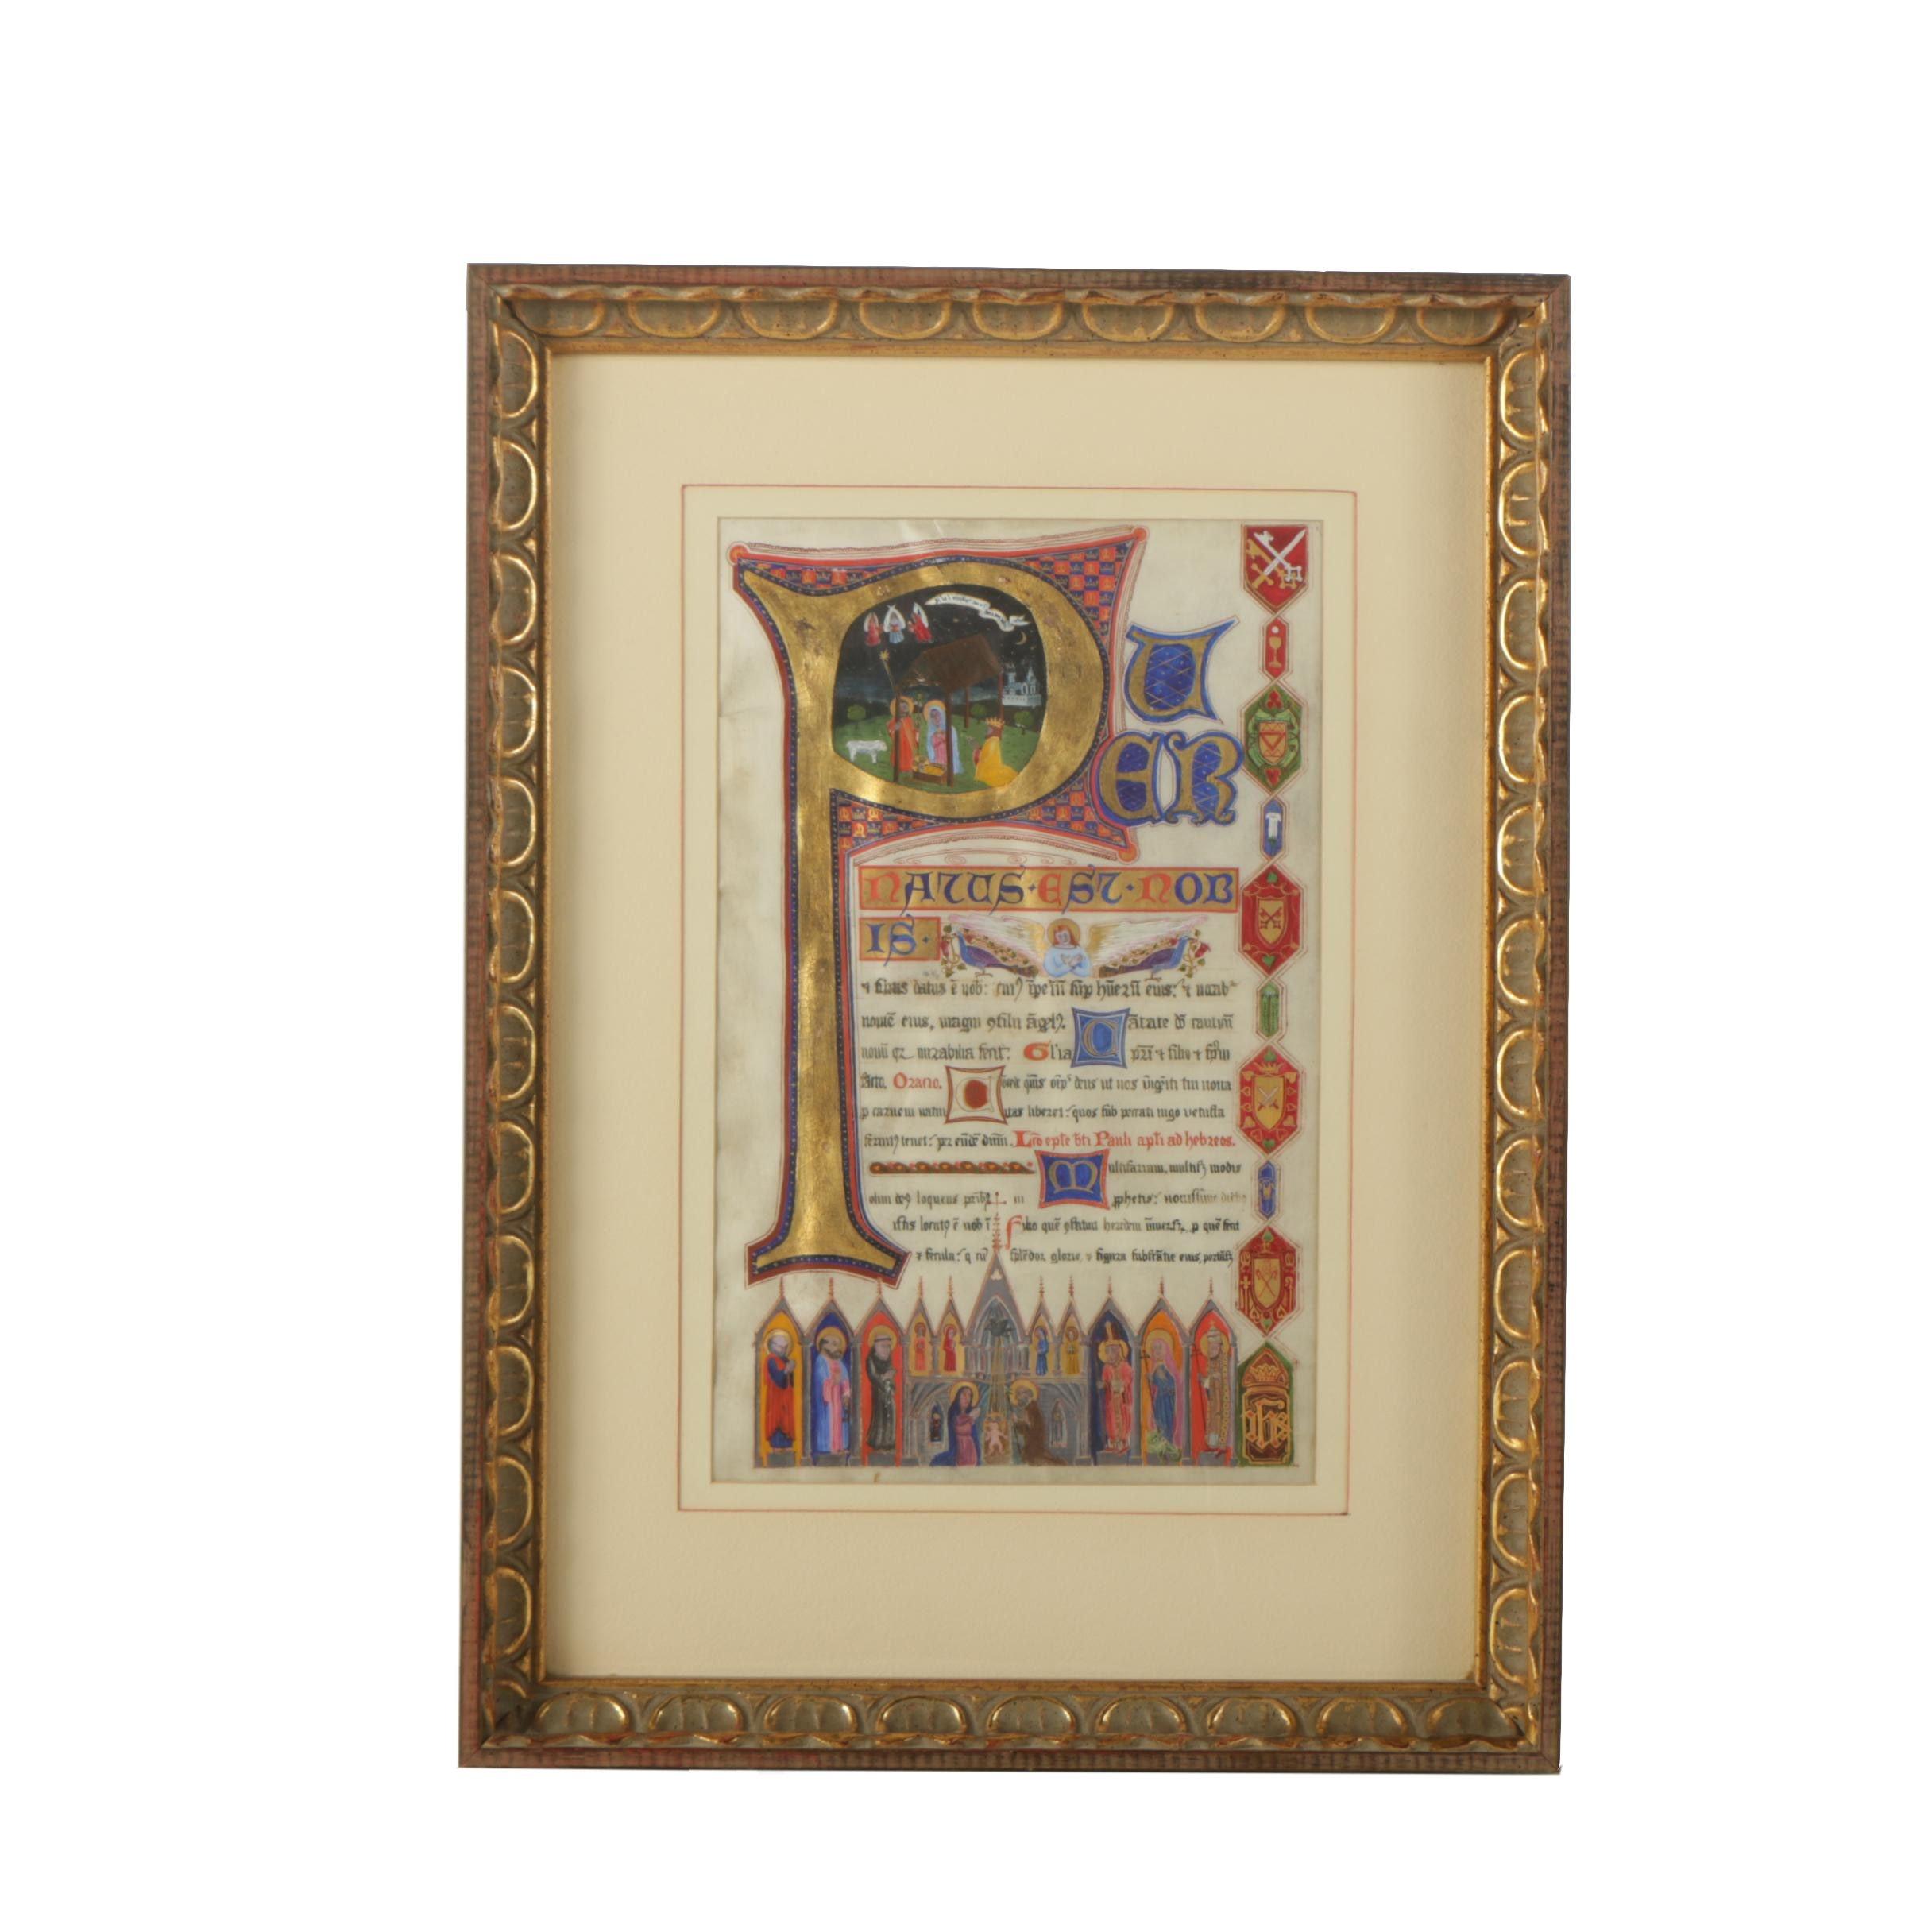 Antique Illuminated Manuscript on Parchment